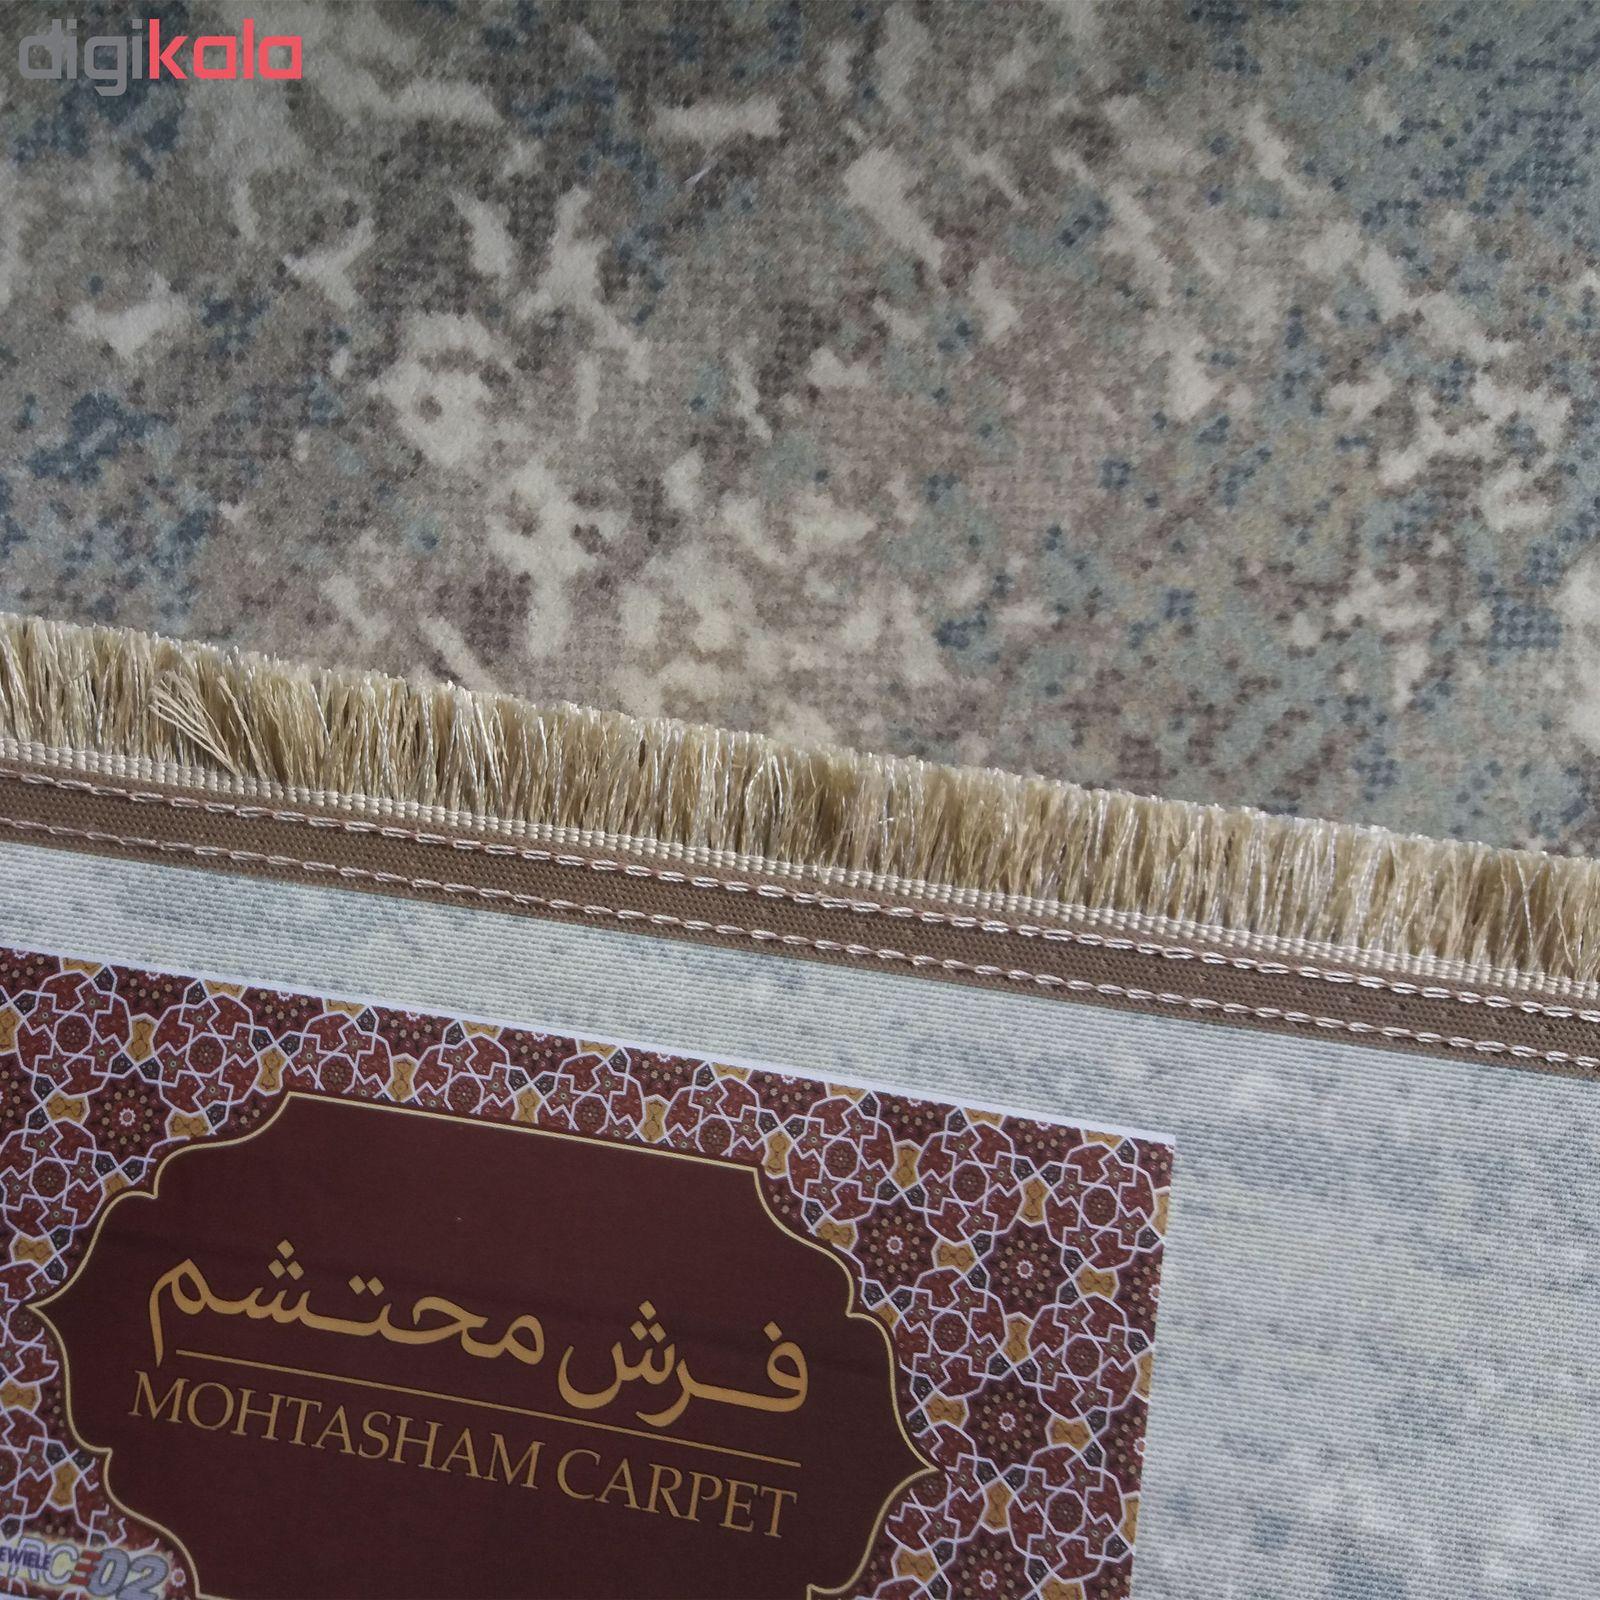 فرش ماشینی محتشم طرح کهنه نما کد 100633 زمینه خاکستری main 1 8